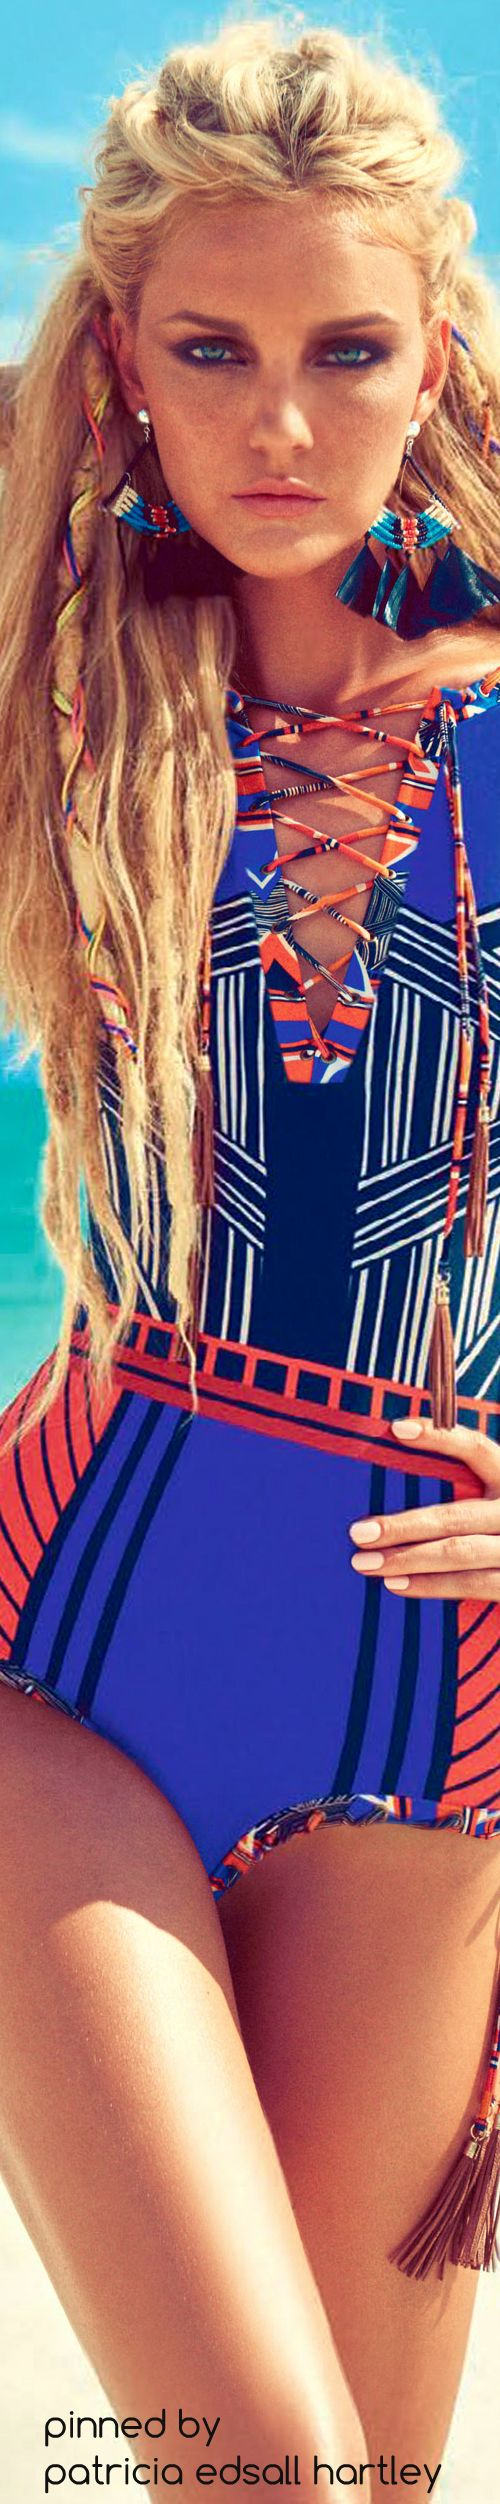 Vogue Brazil November 2015 Model: Caroline Trentini bohemian fashion lace up #Unique_Boho_Style